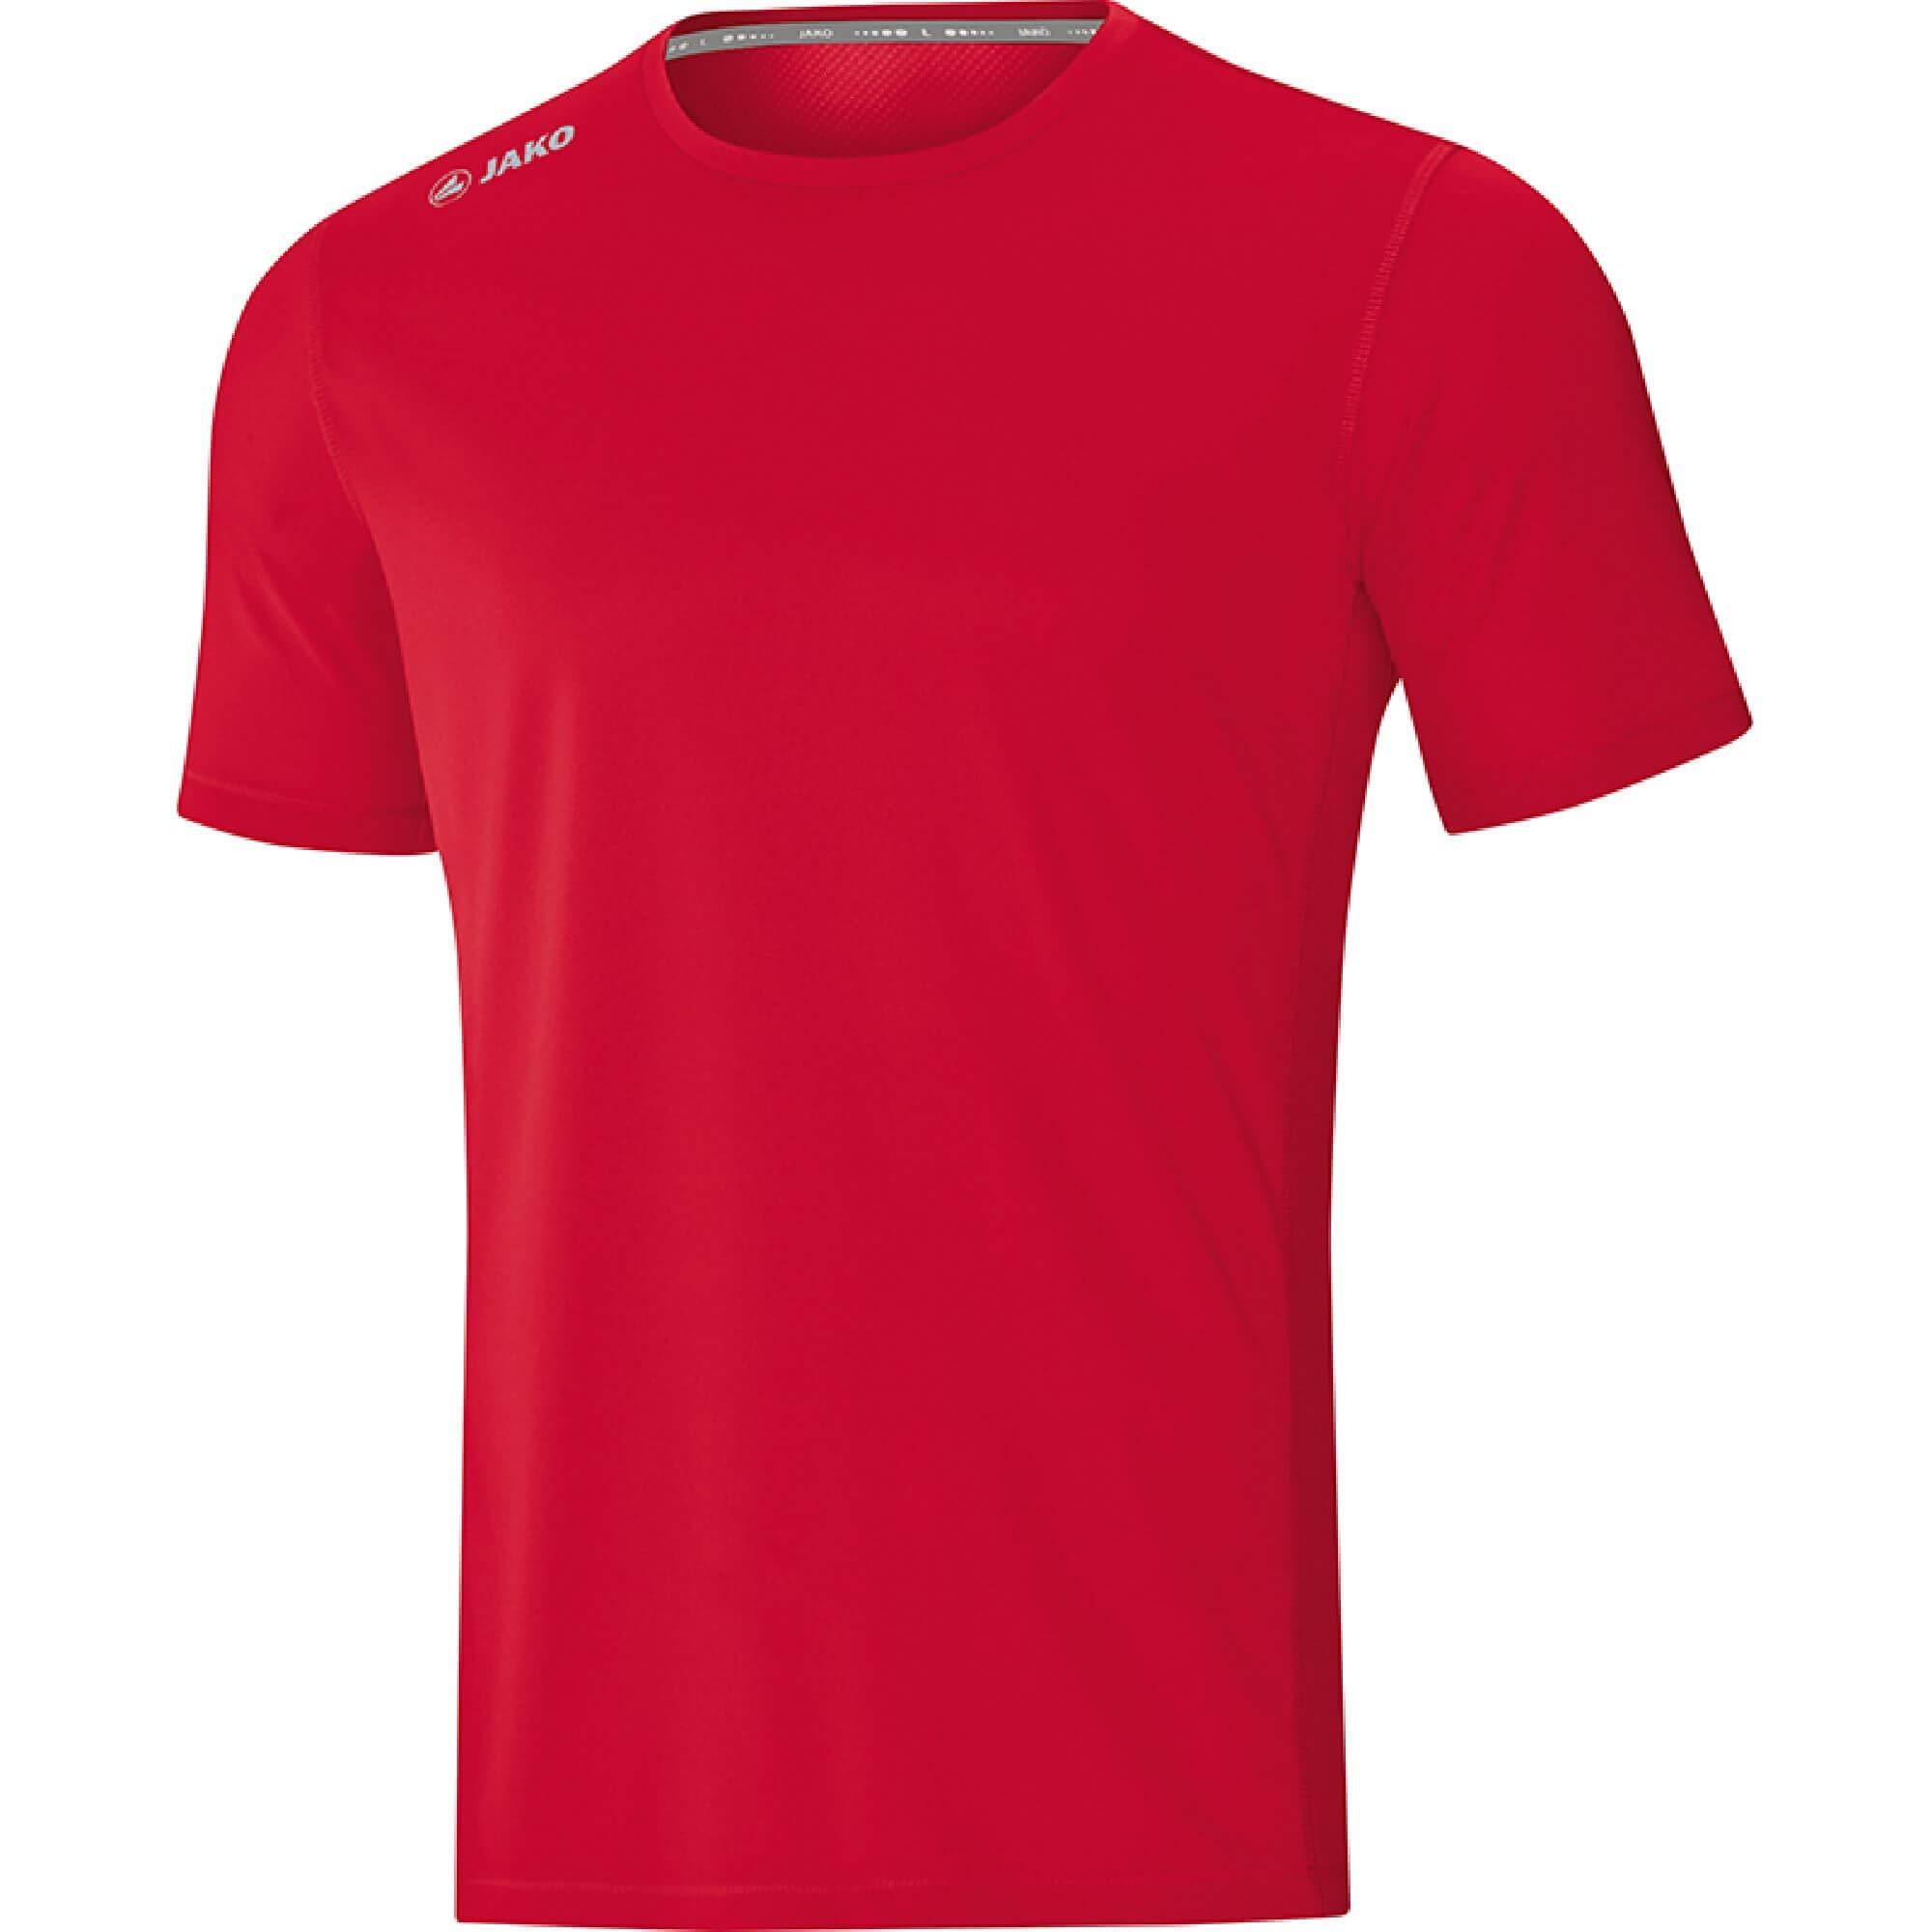 JAKO Herren T-shirt Run 2.0, rot, XL, 6175